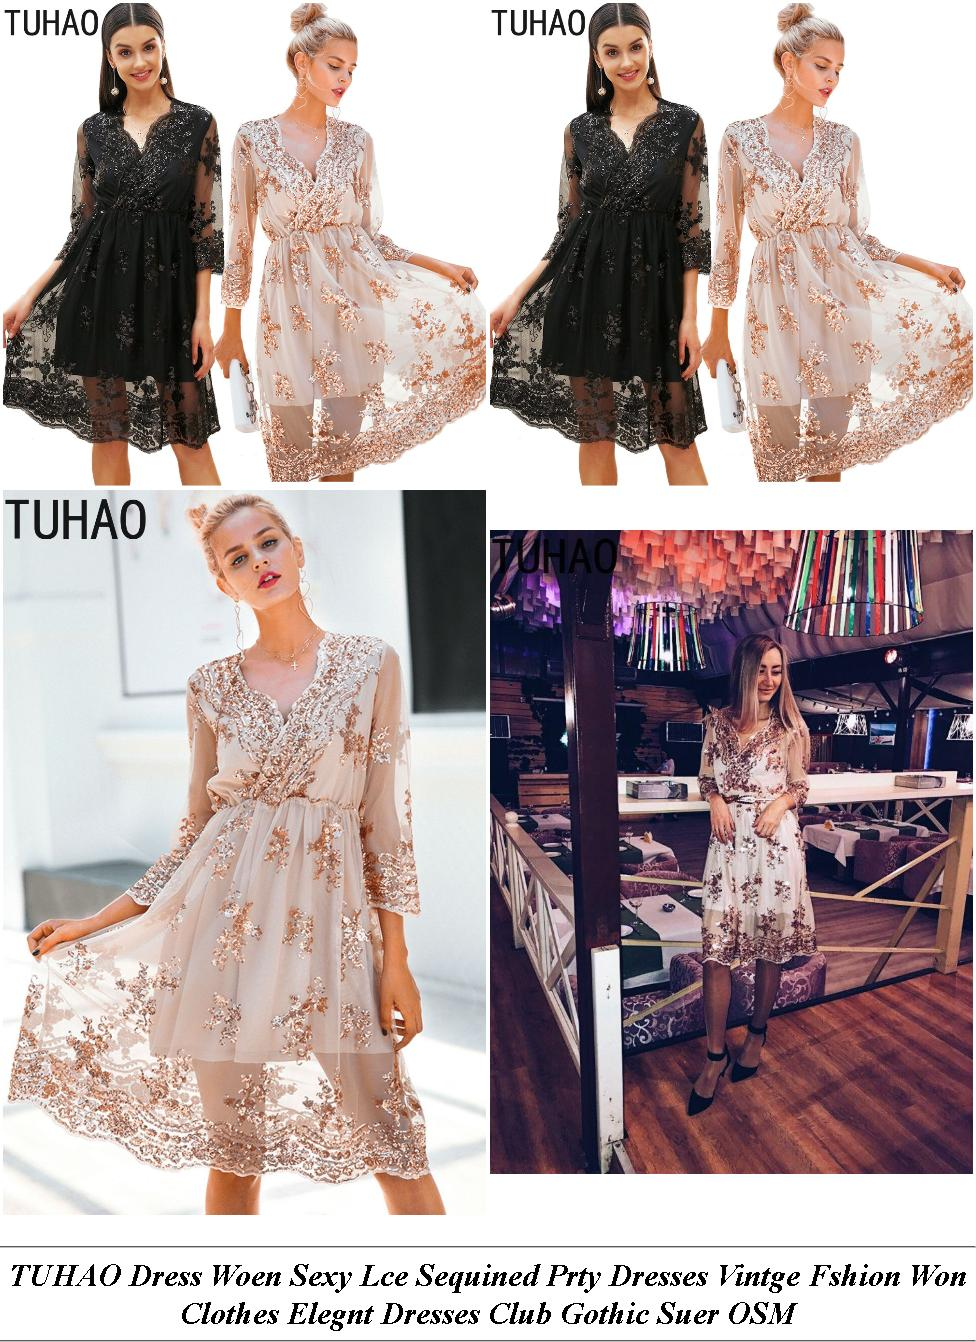 Polka Dot Lue Dress Royal Wedding - Oots Off Sale Ireland - Lack Strapless Dress